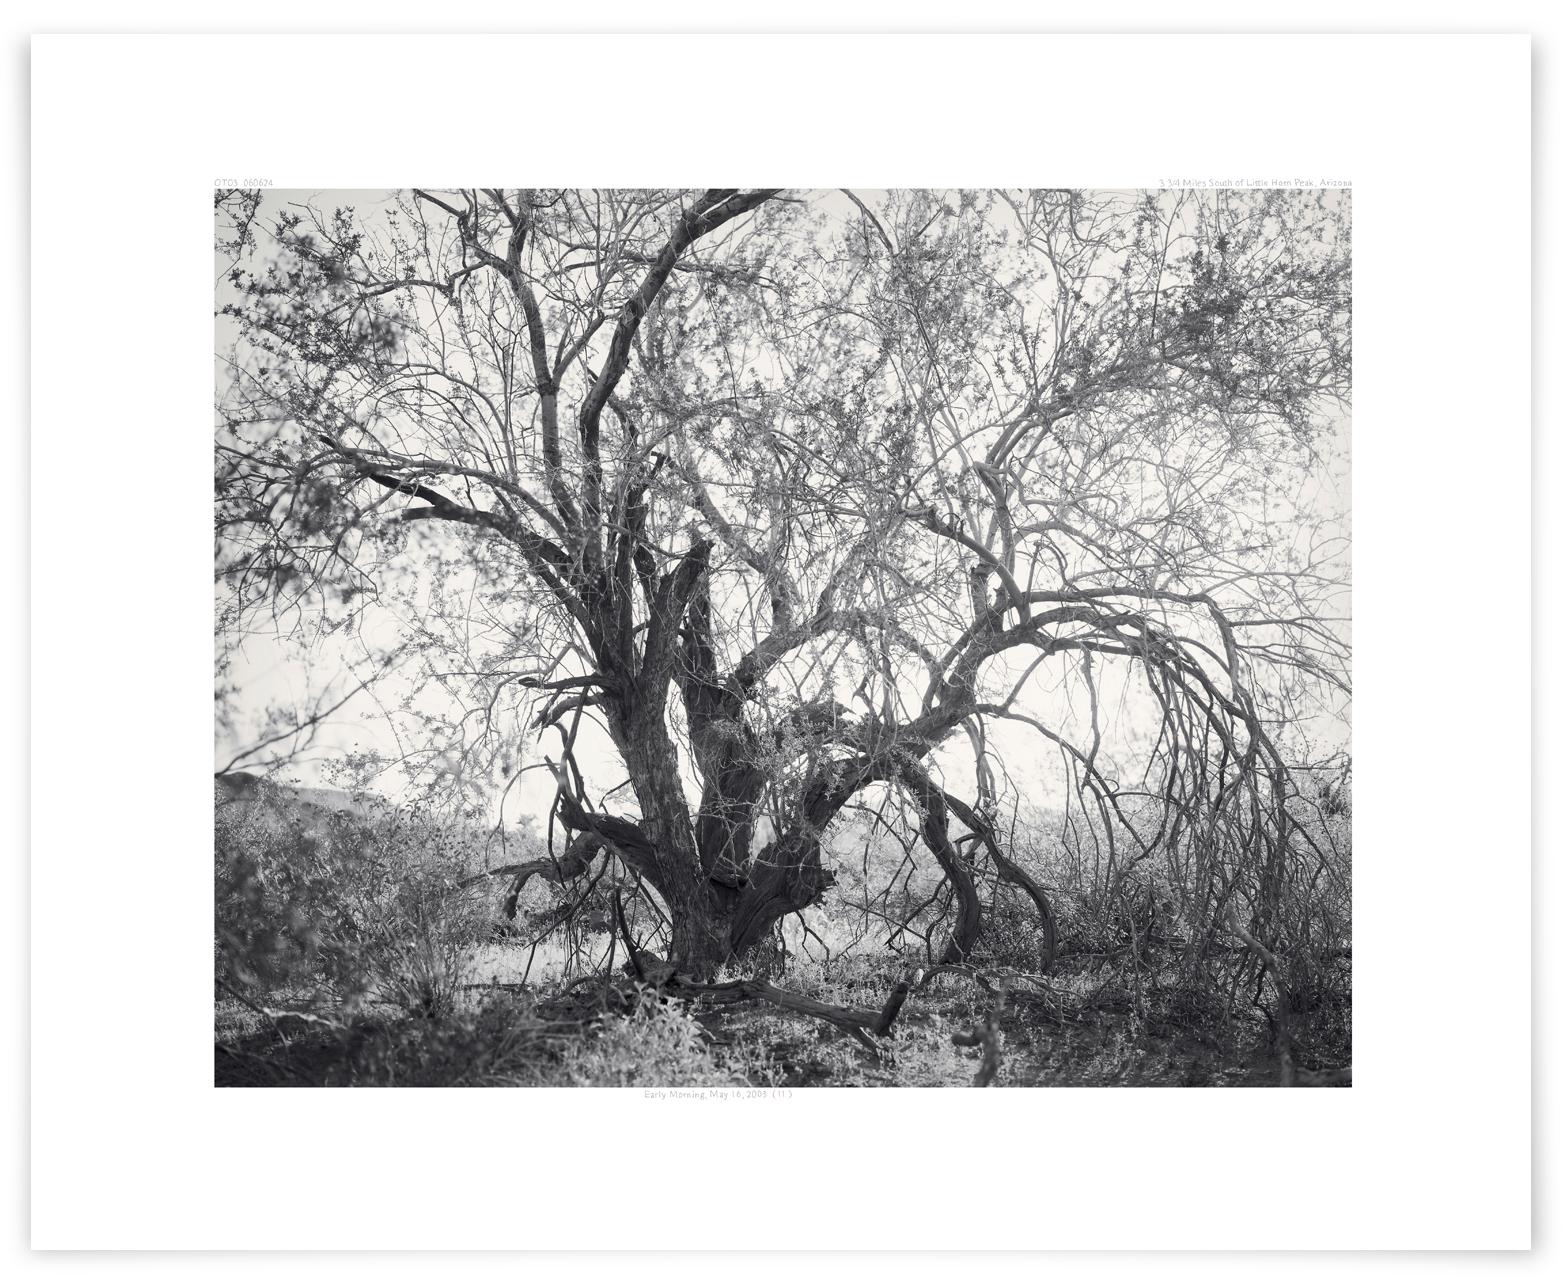 The Palomas Plain Ironwood (OT03 060624)   24 x 31 in (61 x 79 cm)